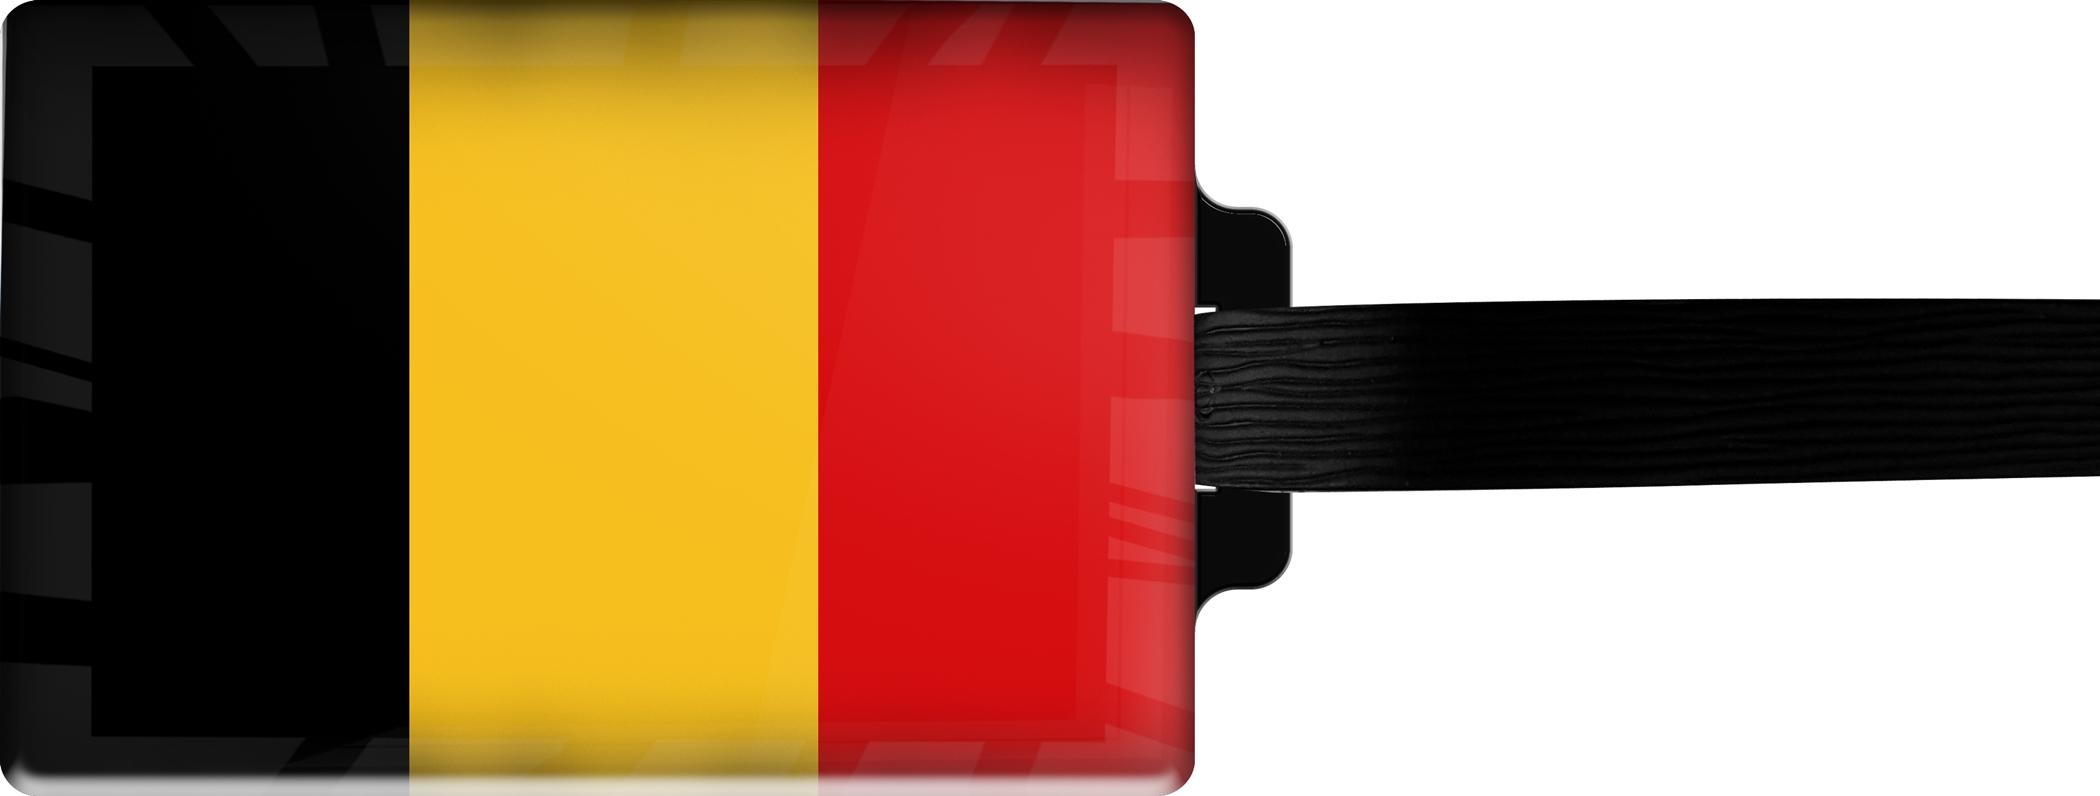 Hochwertiger Gepäckanhänger aus Acrylglas | FLAGGE BELGIEN | metALUm #00082